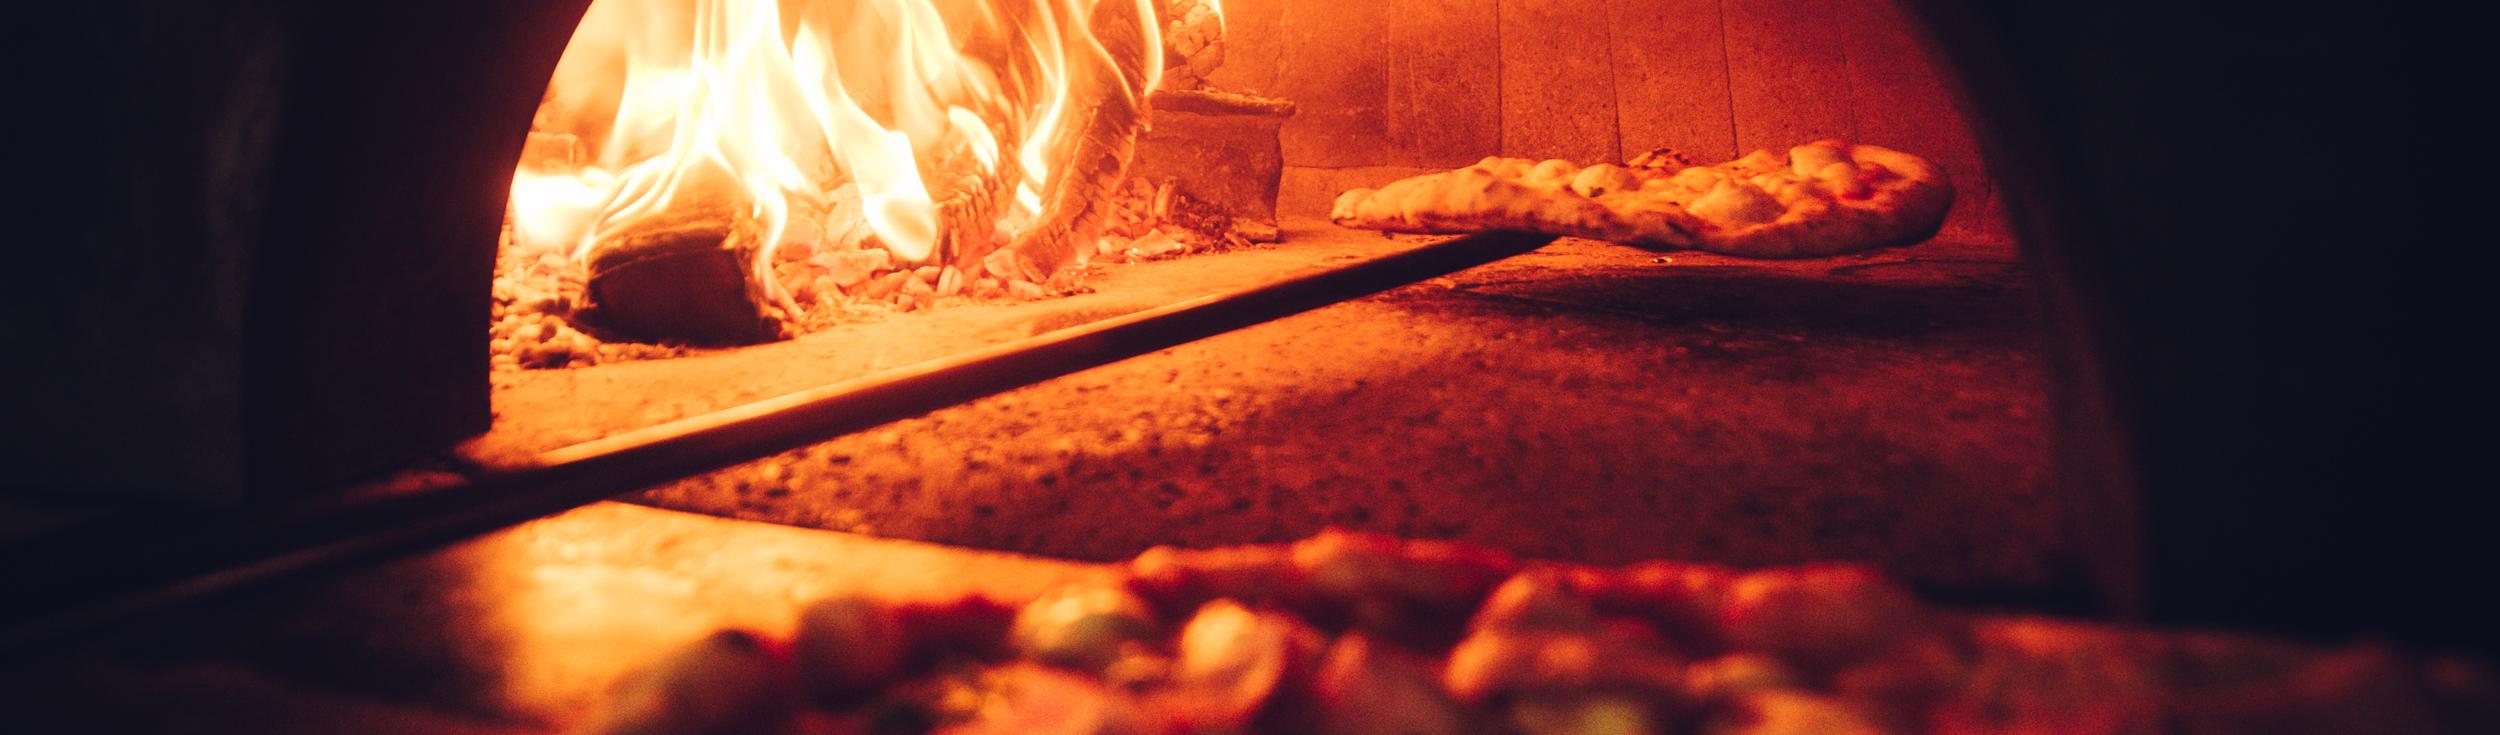 pizzaiolos-barcelona